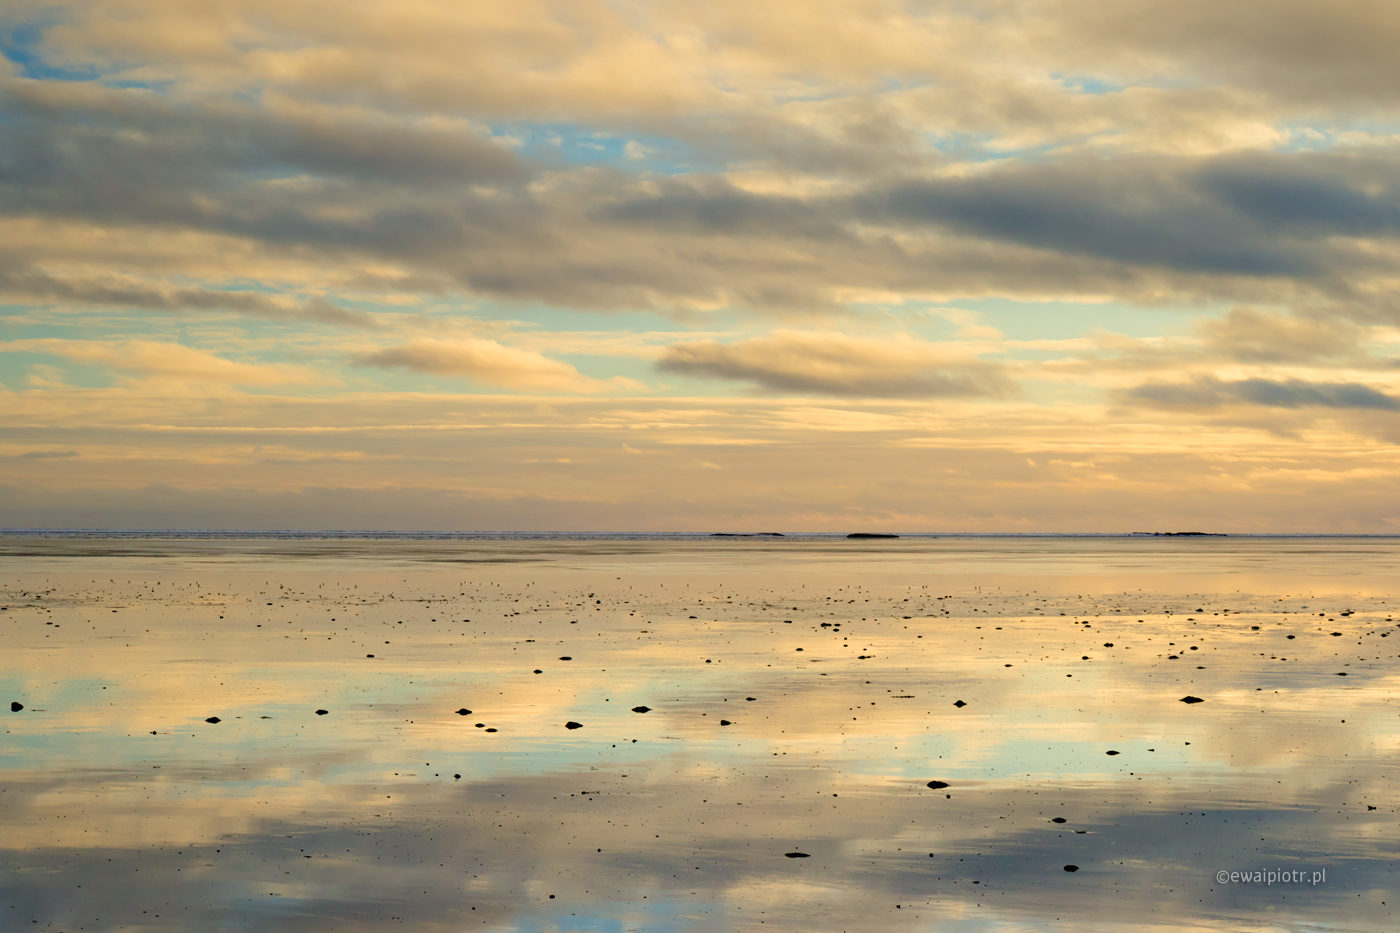 Piegowate morze, Islandia